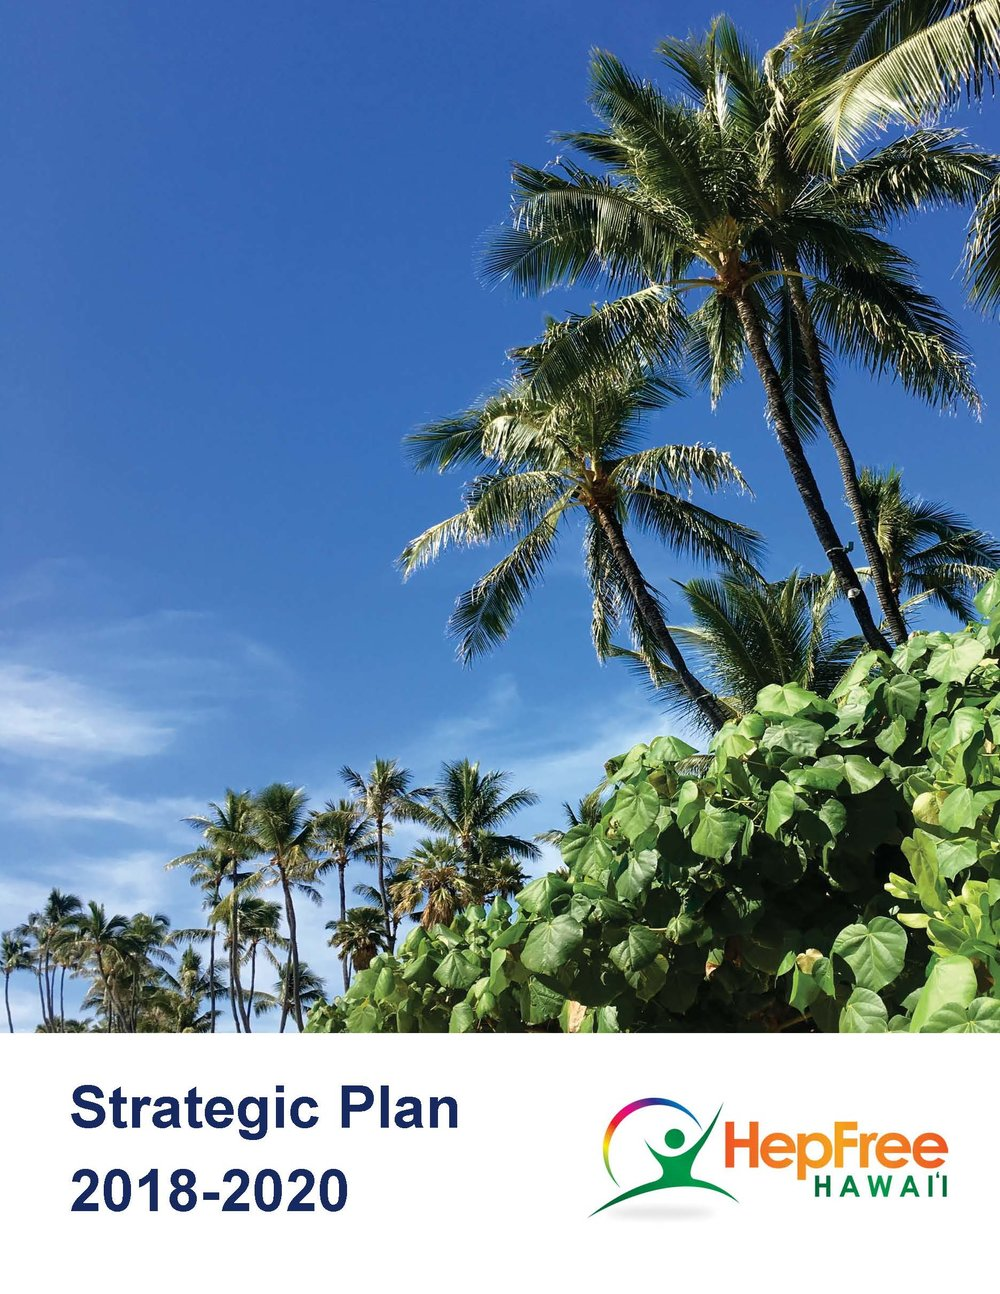 HFH Strategic  Plan 2018-2020 Cover.jpg